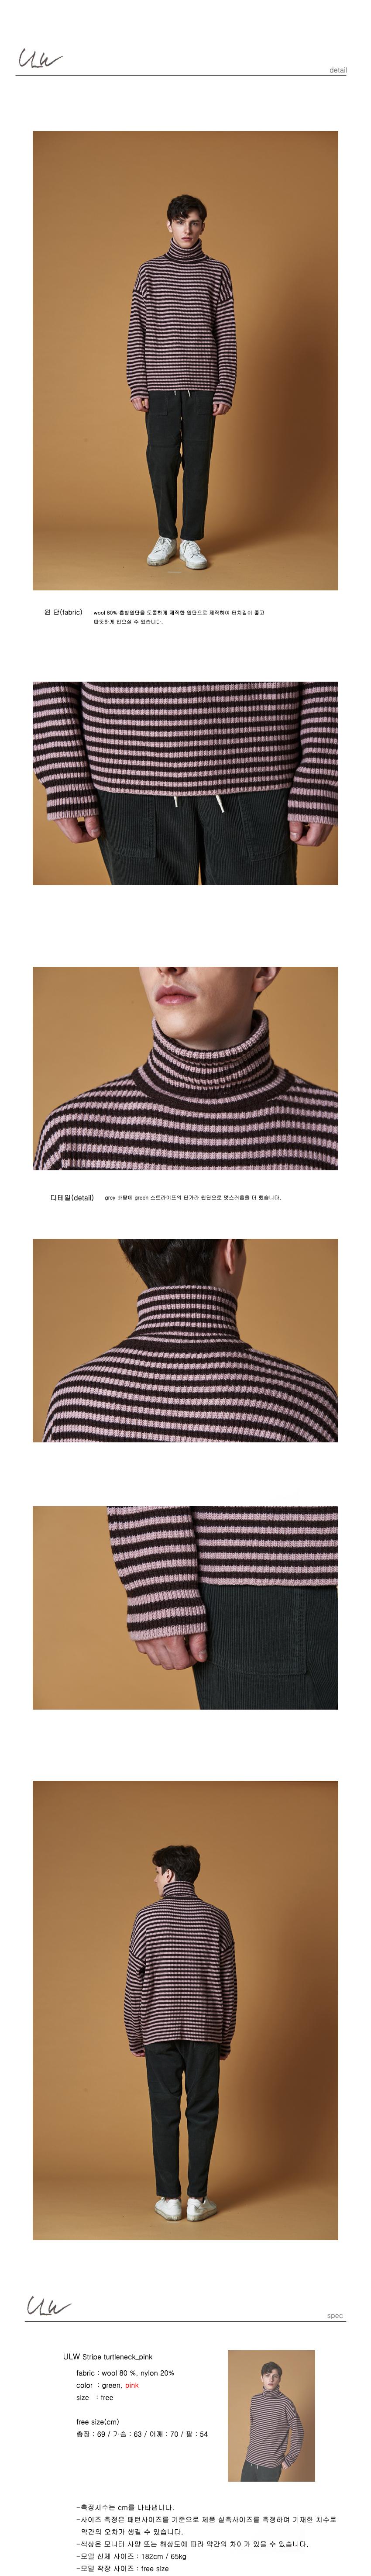 ulw-stripe-turtleneck_pink_2.jpg